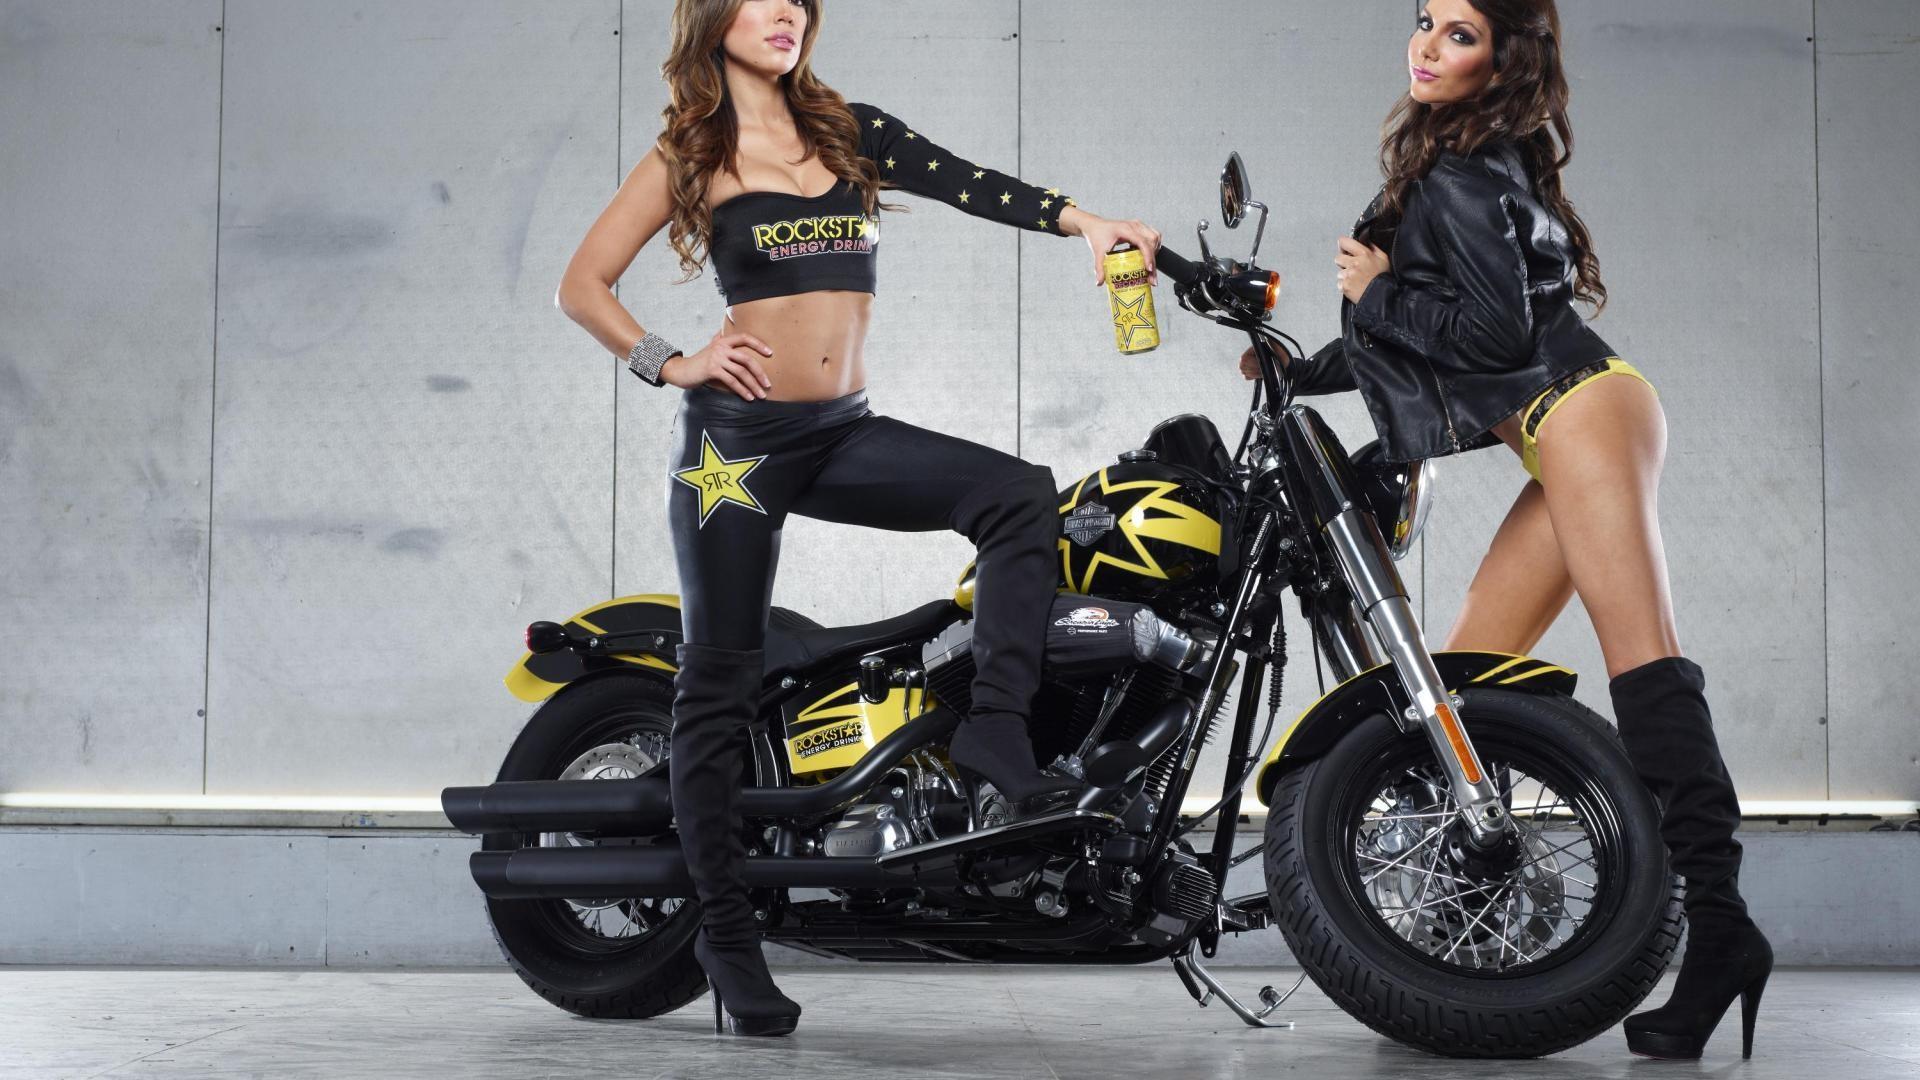 Rockstar Energy Harley Davidson Girls Picture